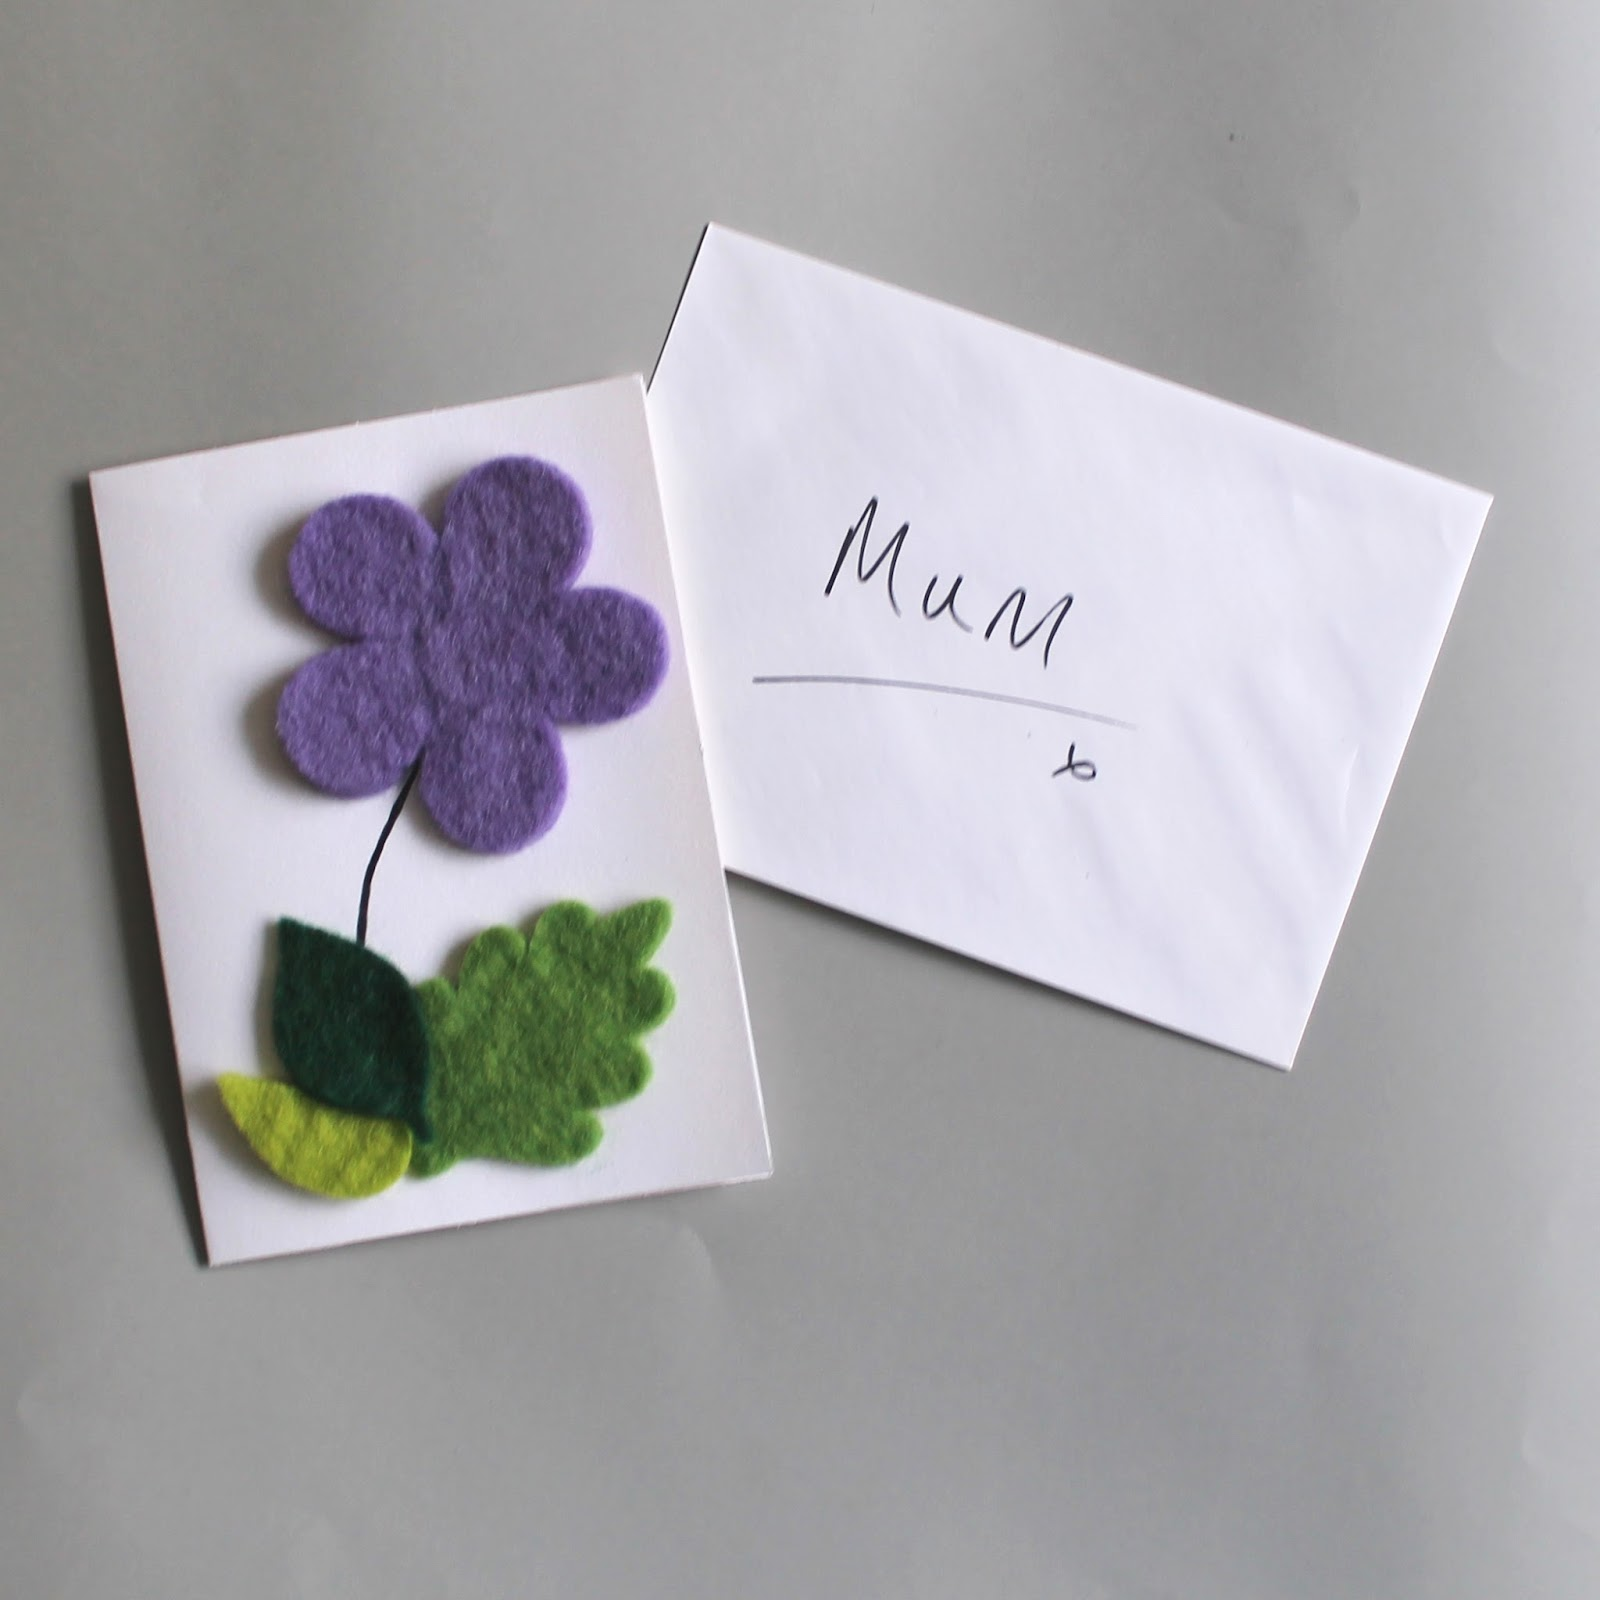 Live It Love It Make It Make It Felt Cards With Blooming Felt